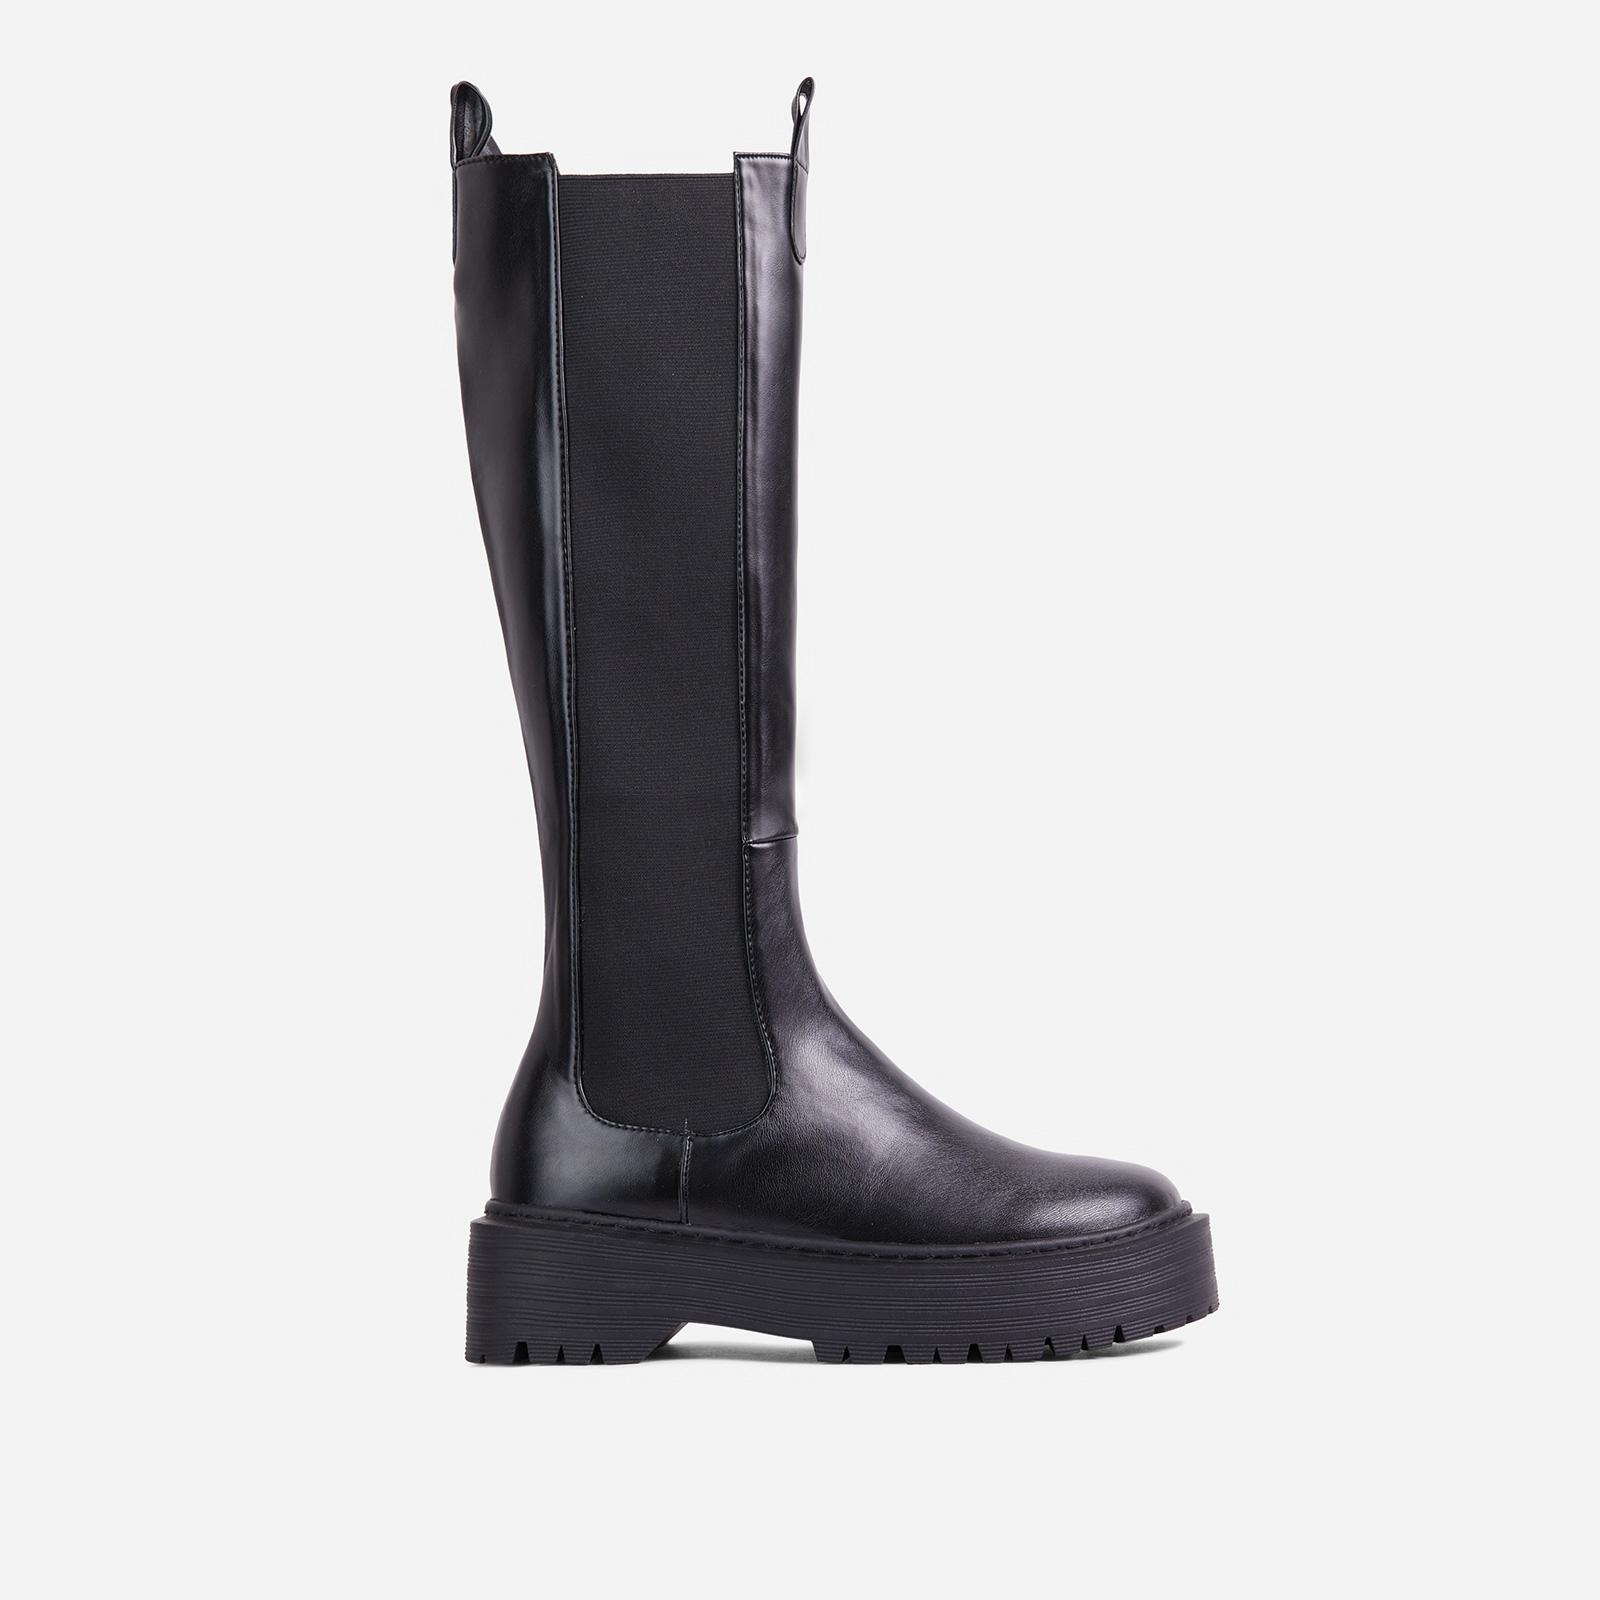 EGO Leona Chunky Sole Knee High Long Biker Boot in Black Faux Leather, Black  - female - Size: 6